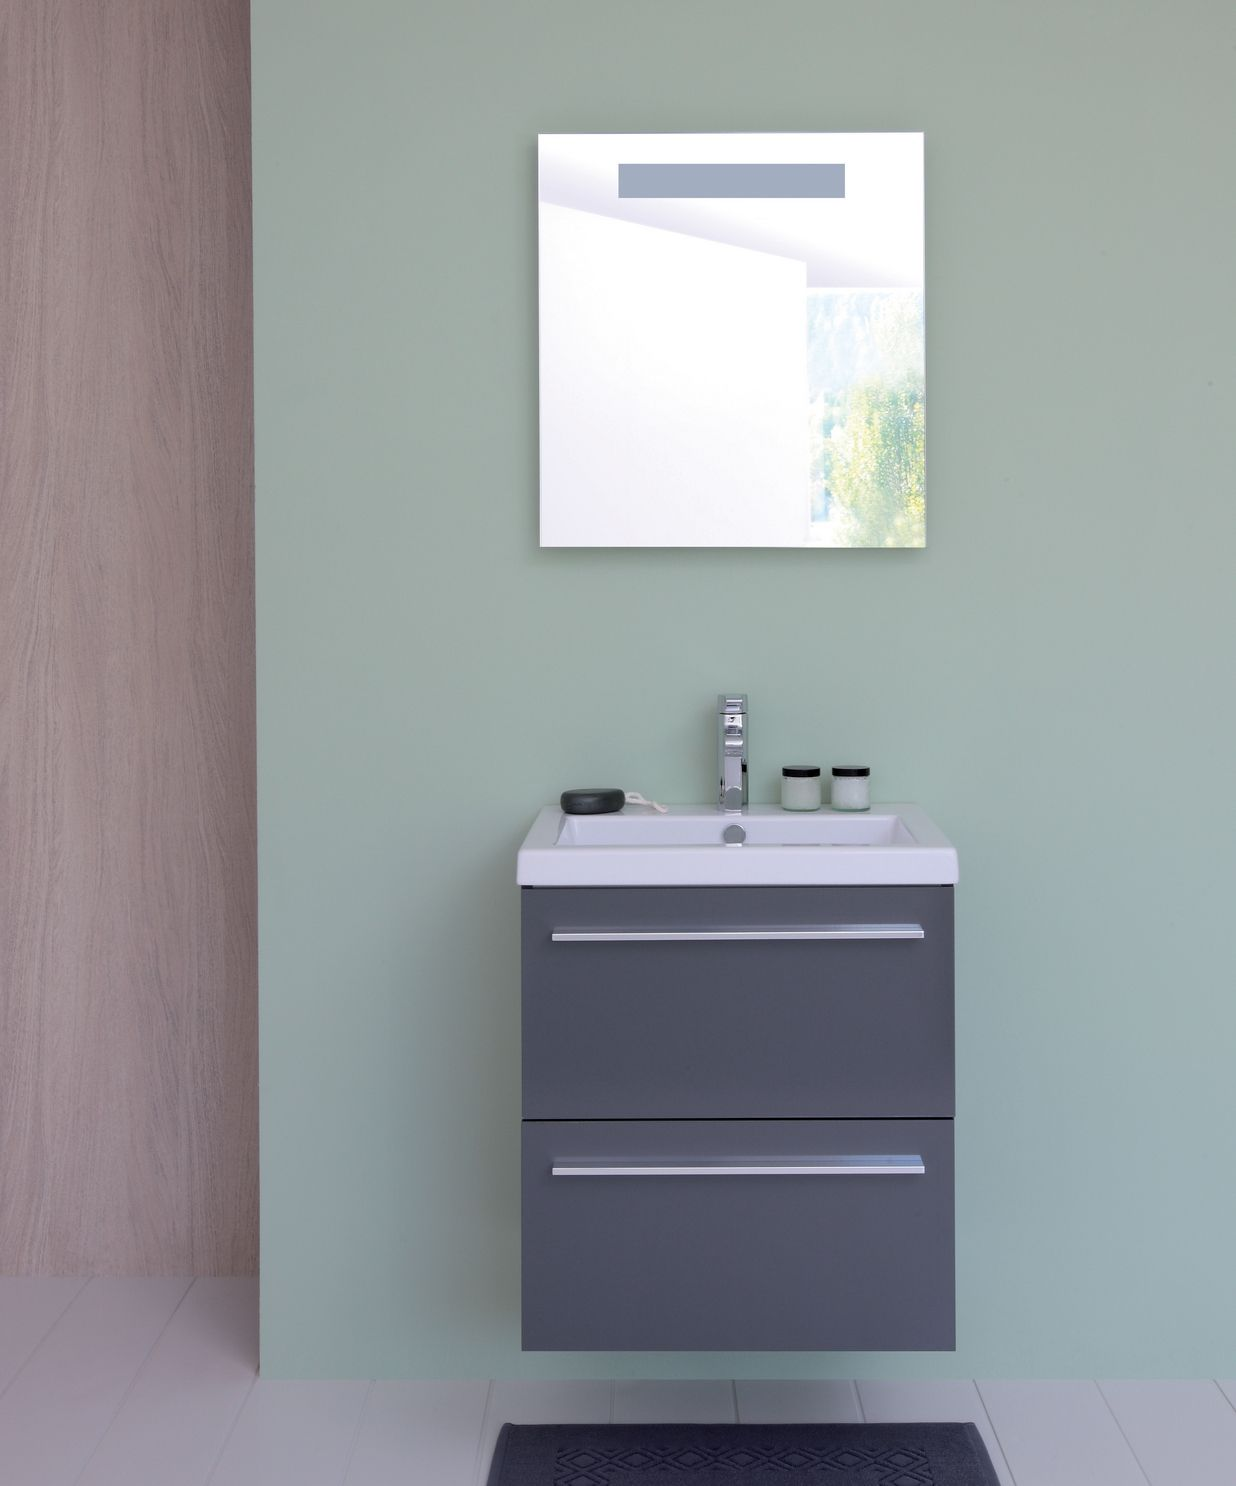 Meuble Salle De Bain Sanijura Xs ~ meuble vasque salle de bain gris laqu sanijura http www deco et